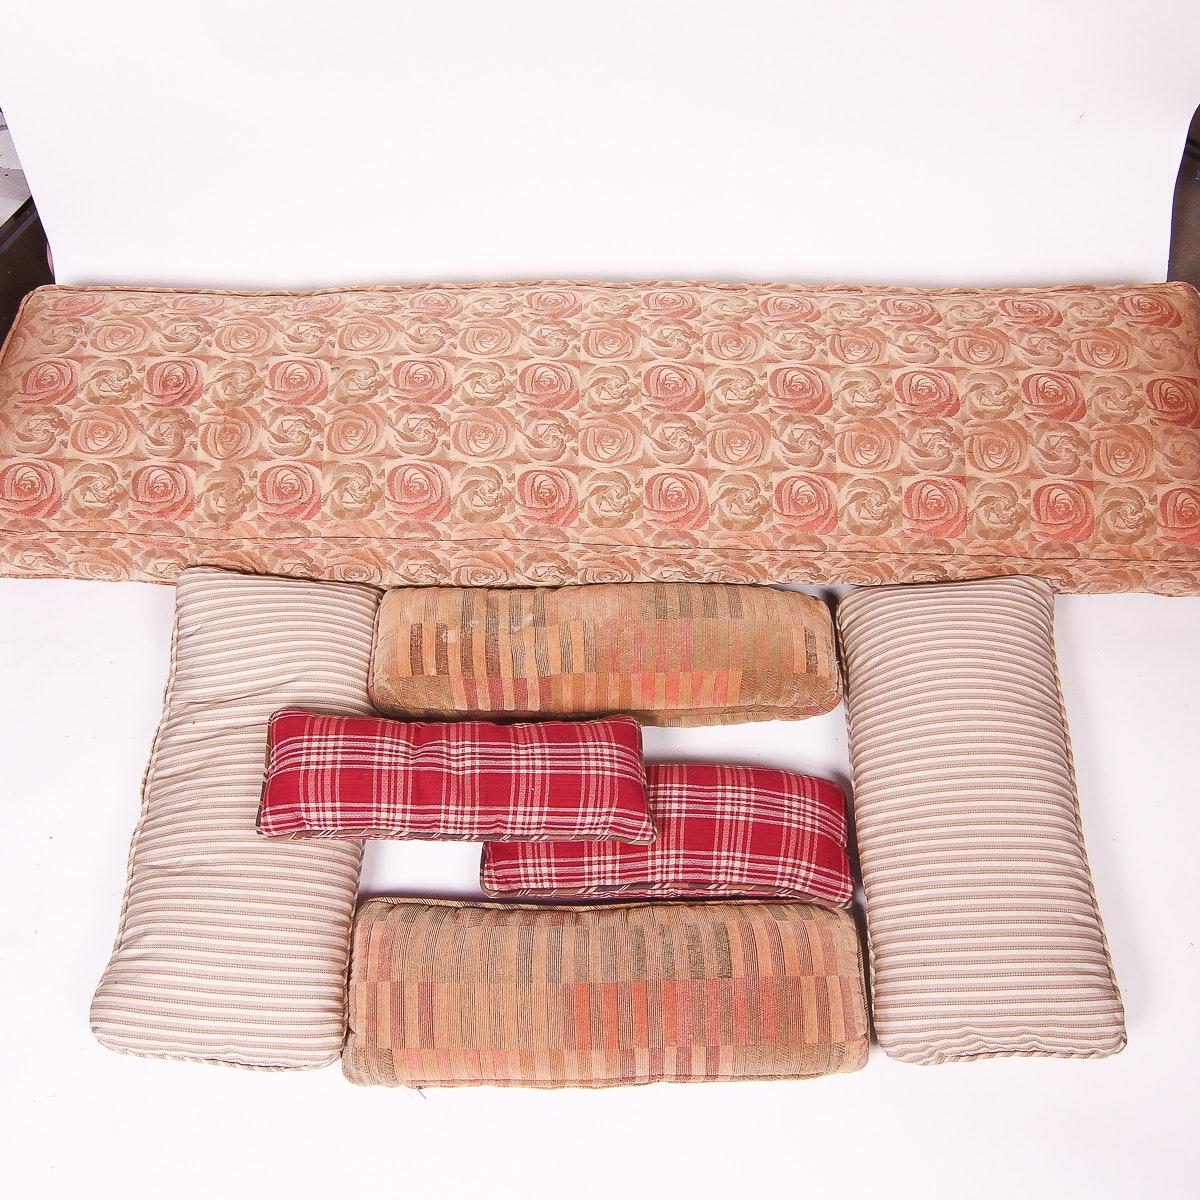 Assortment of Decorative Pillows